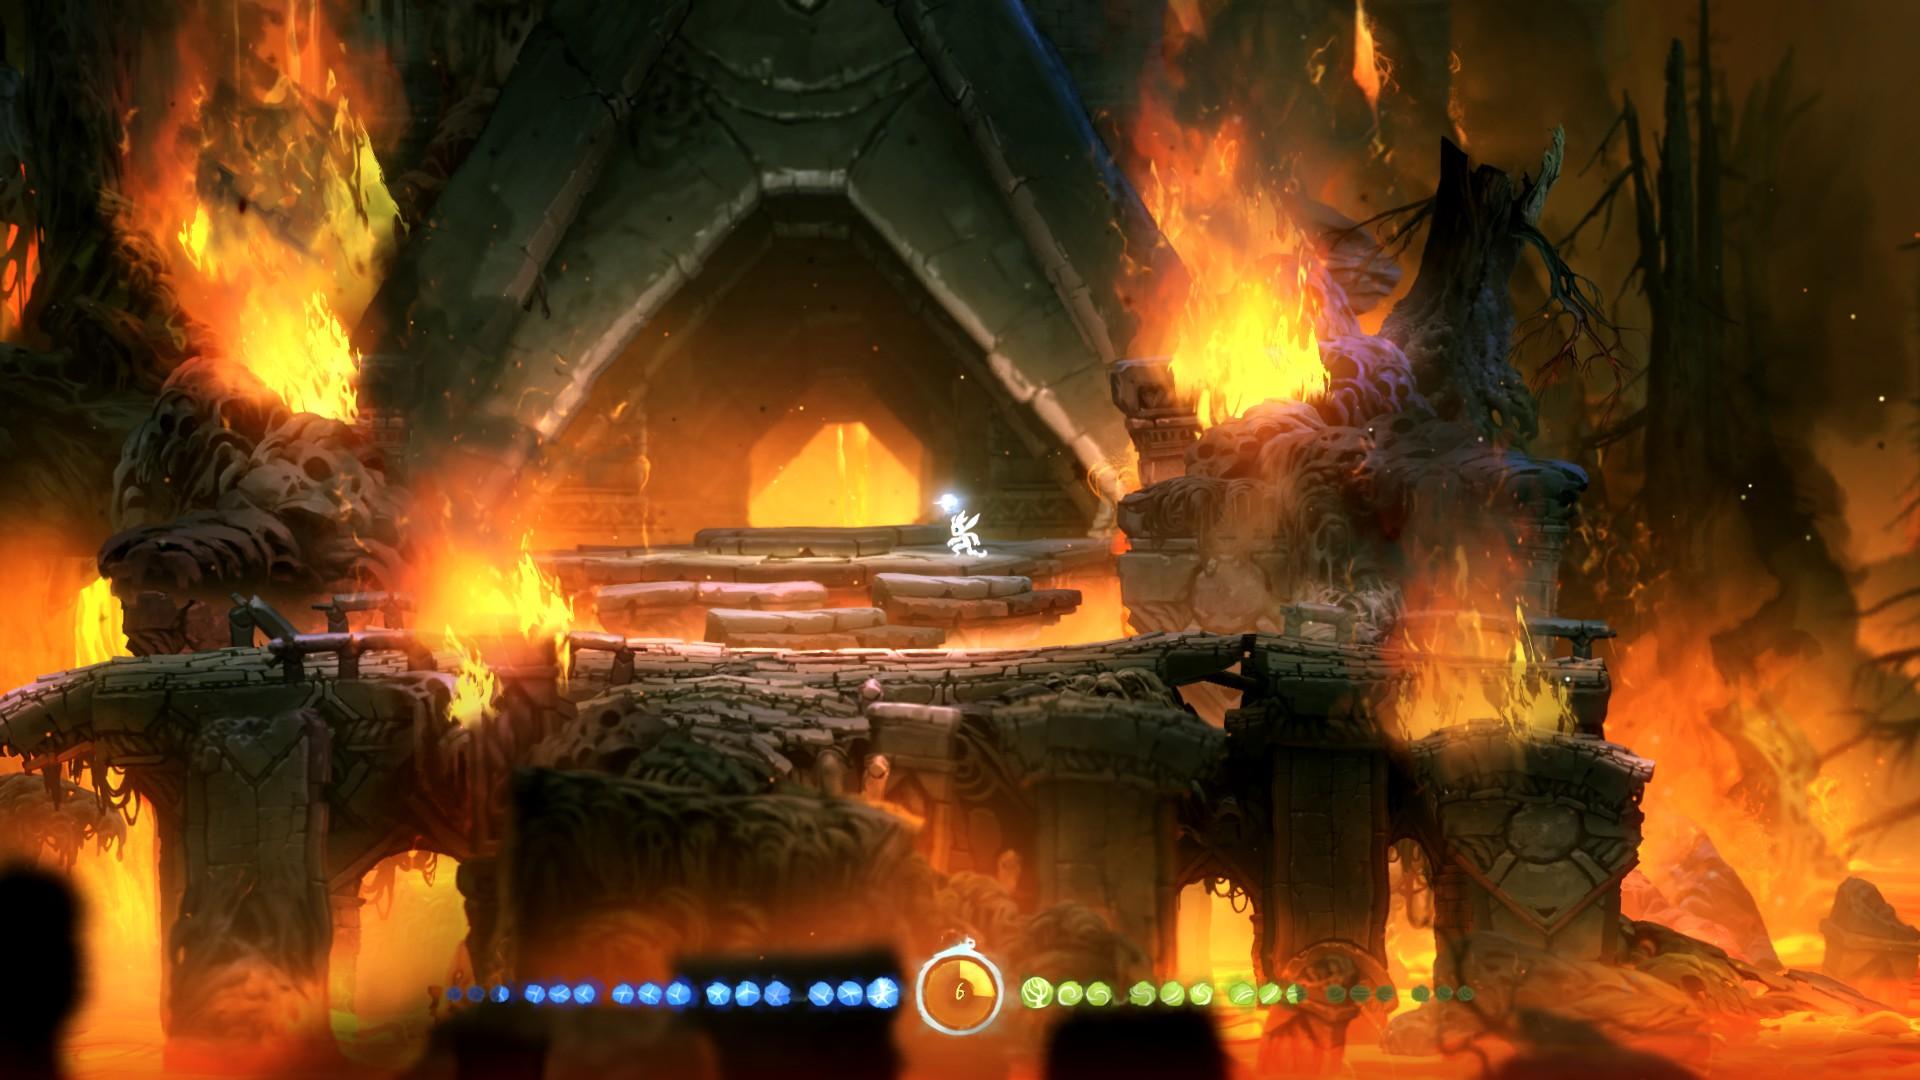 Ori and the Blind Forest: Eingang des Horubergs mit Feuersymbolik. (Quelle: eigener Screenshot)